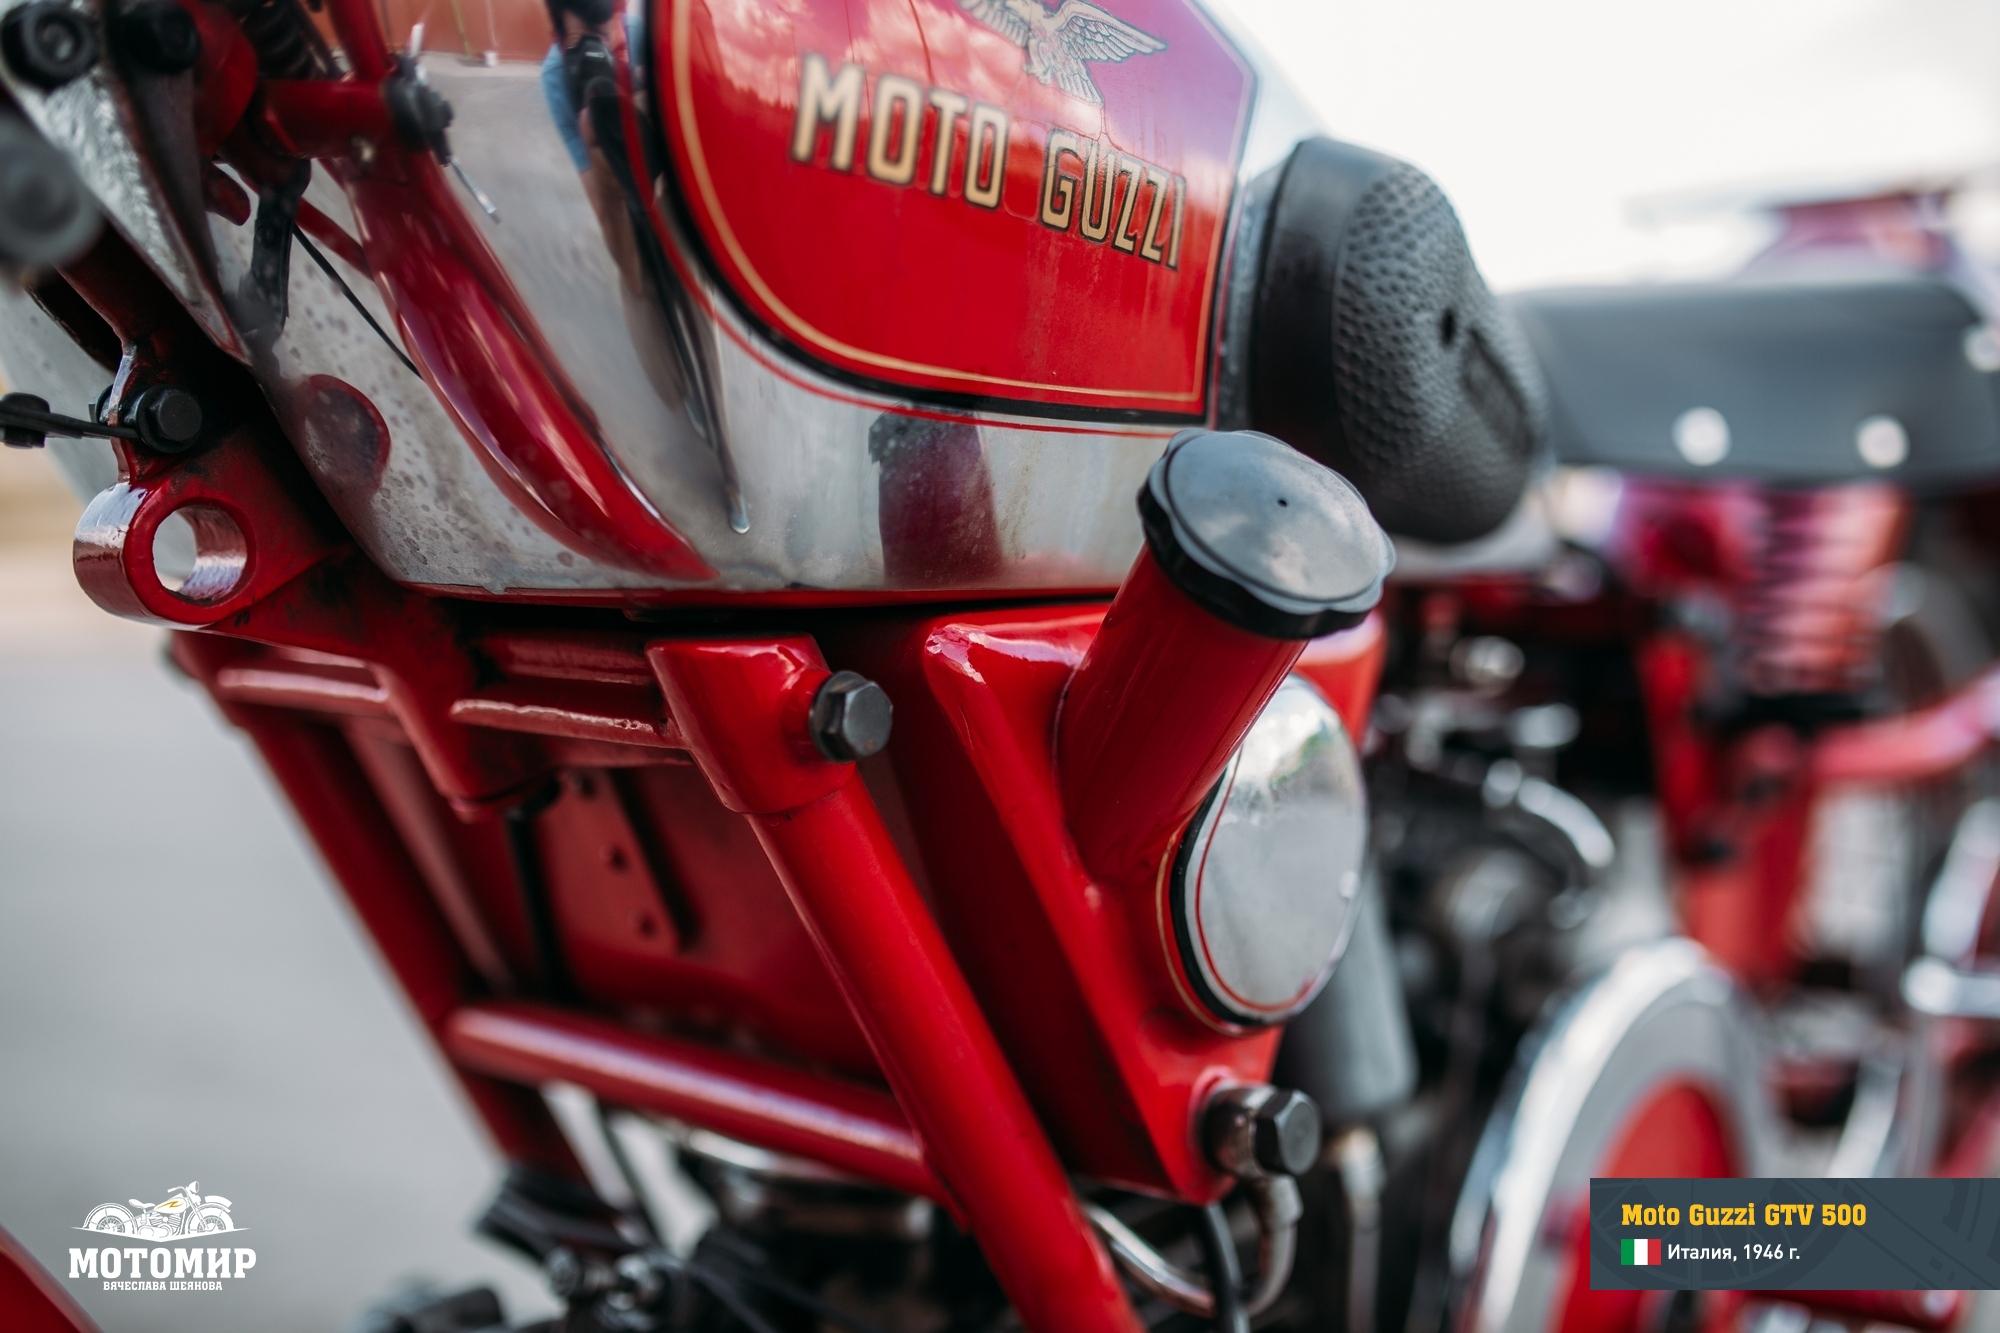 moto-guzzi-gtv-500-201509-web-34